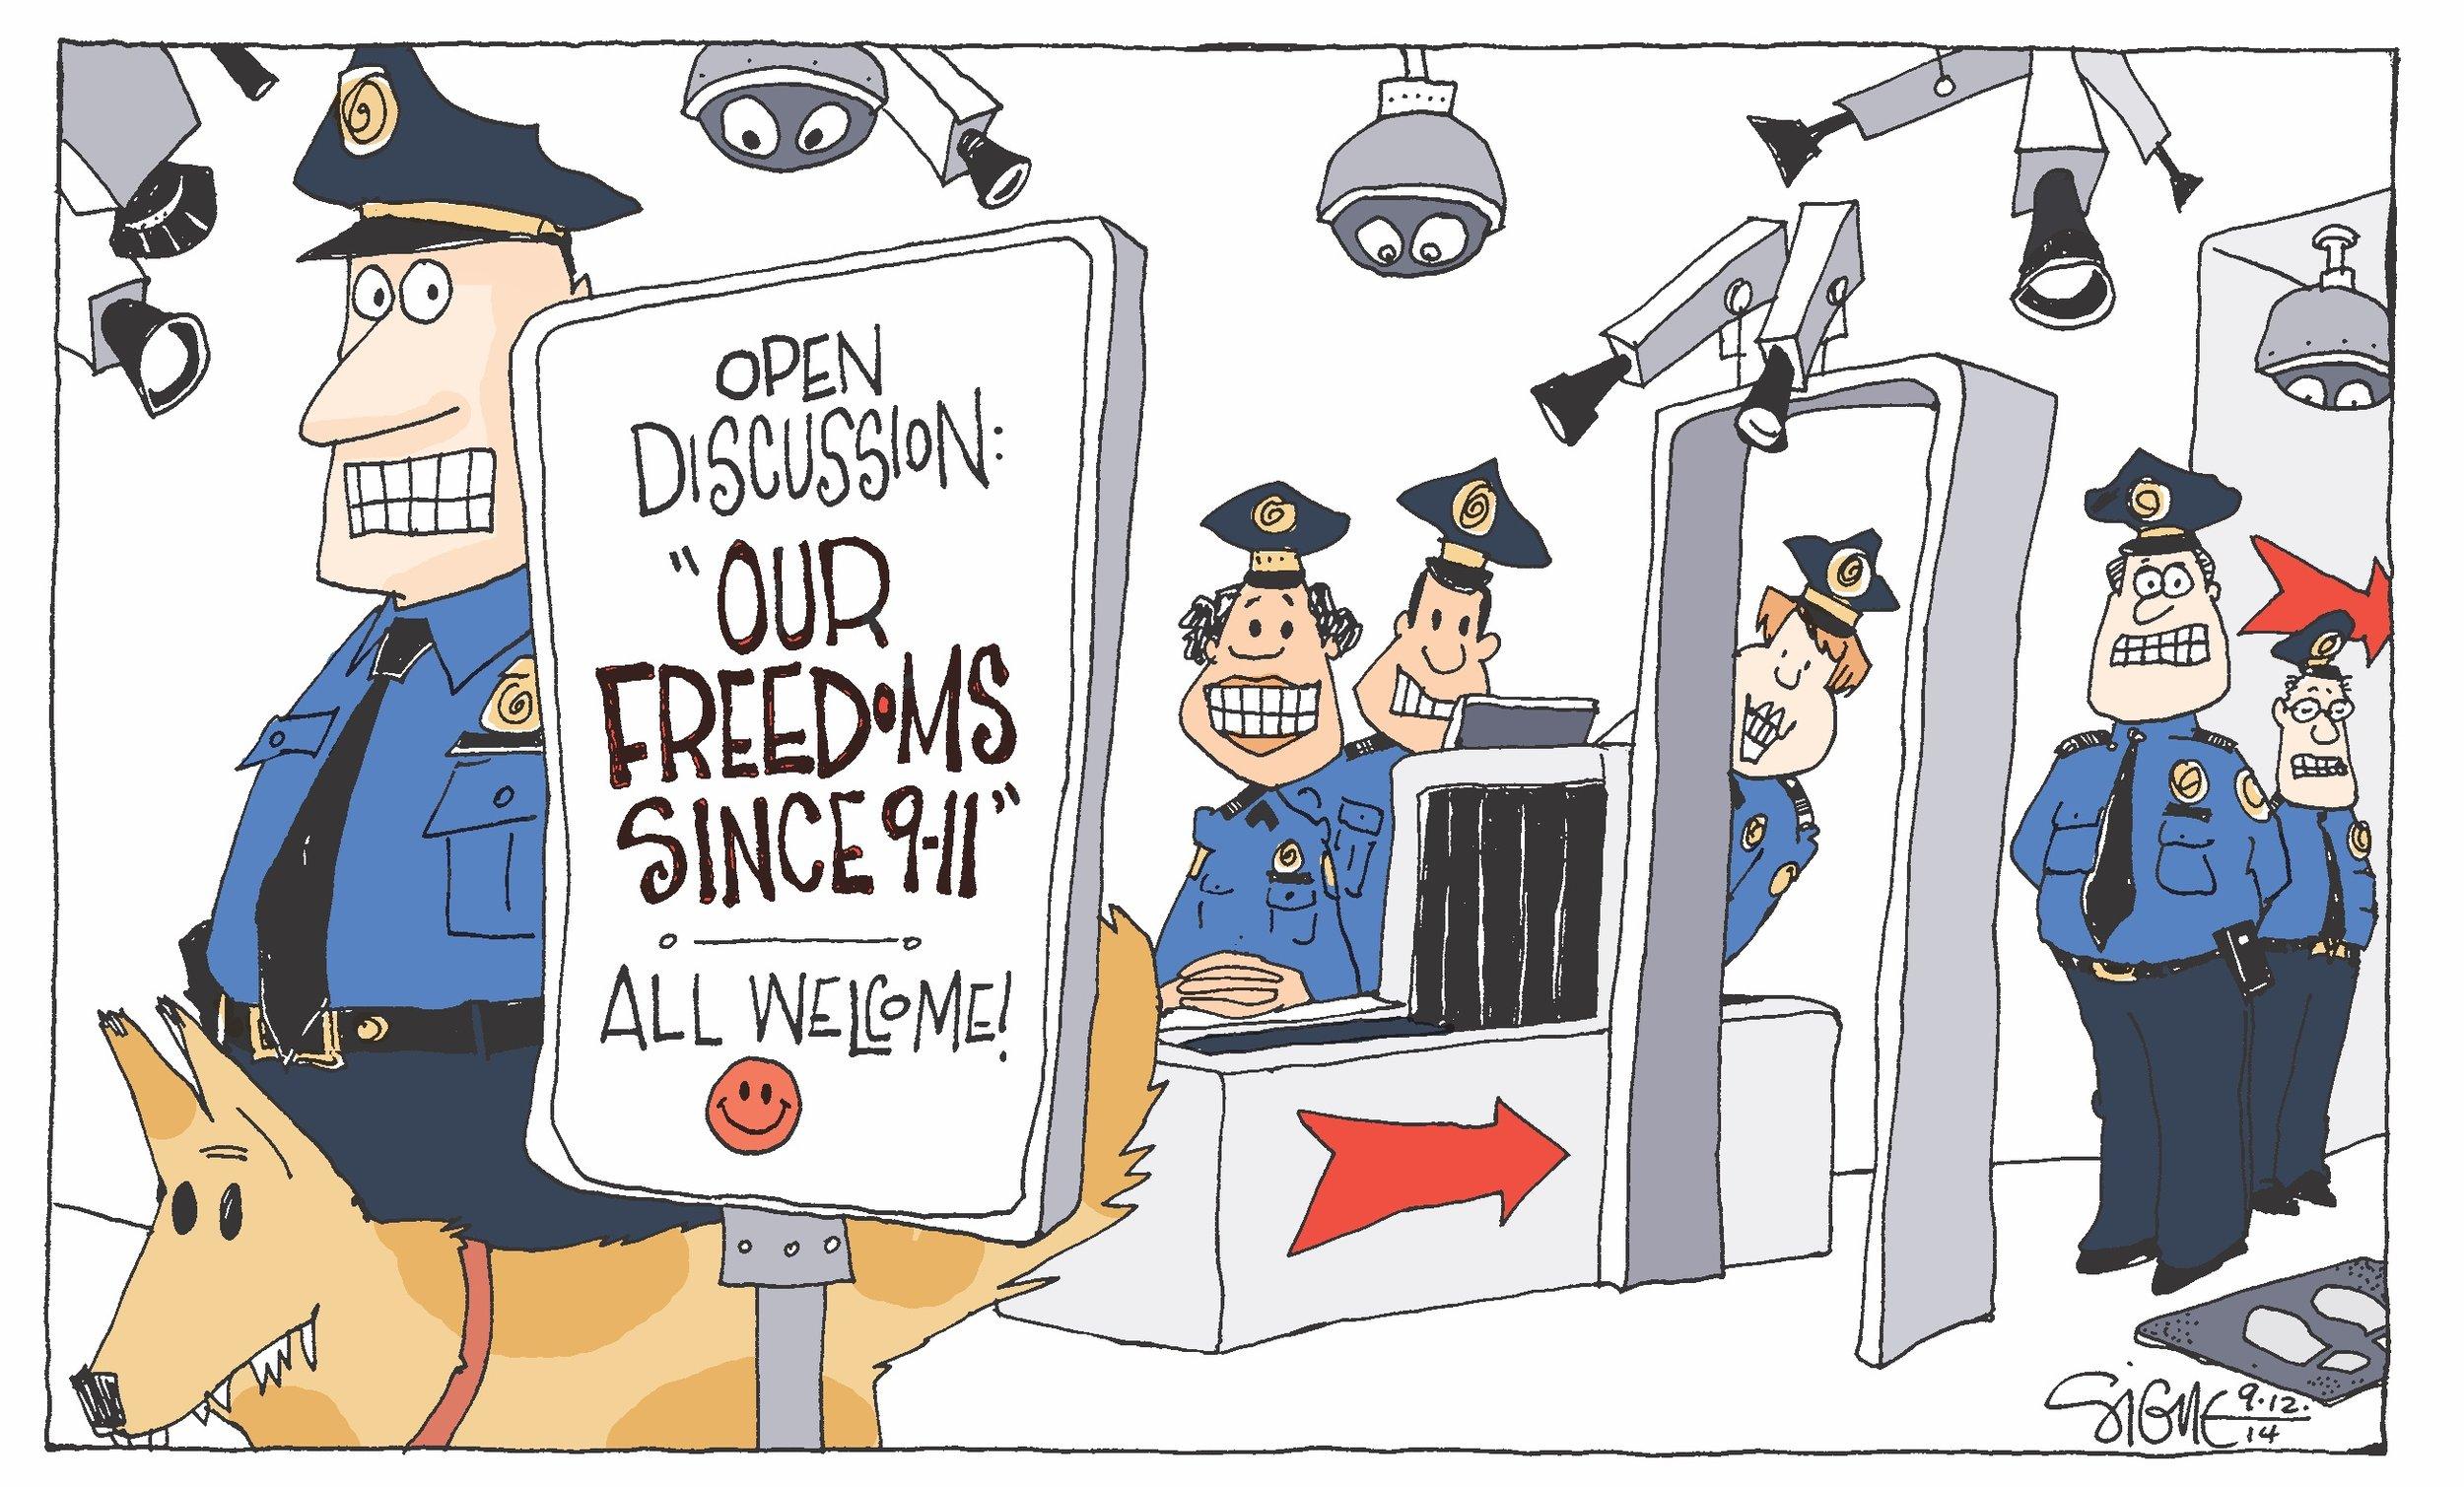 09-12-14 Freedoms.jpg